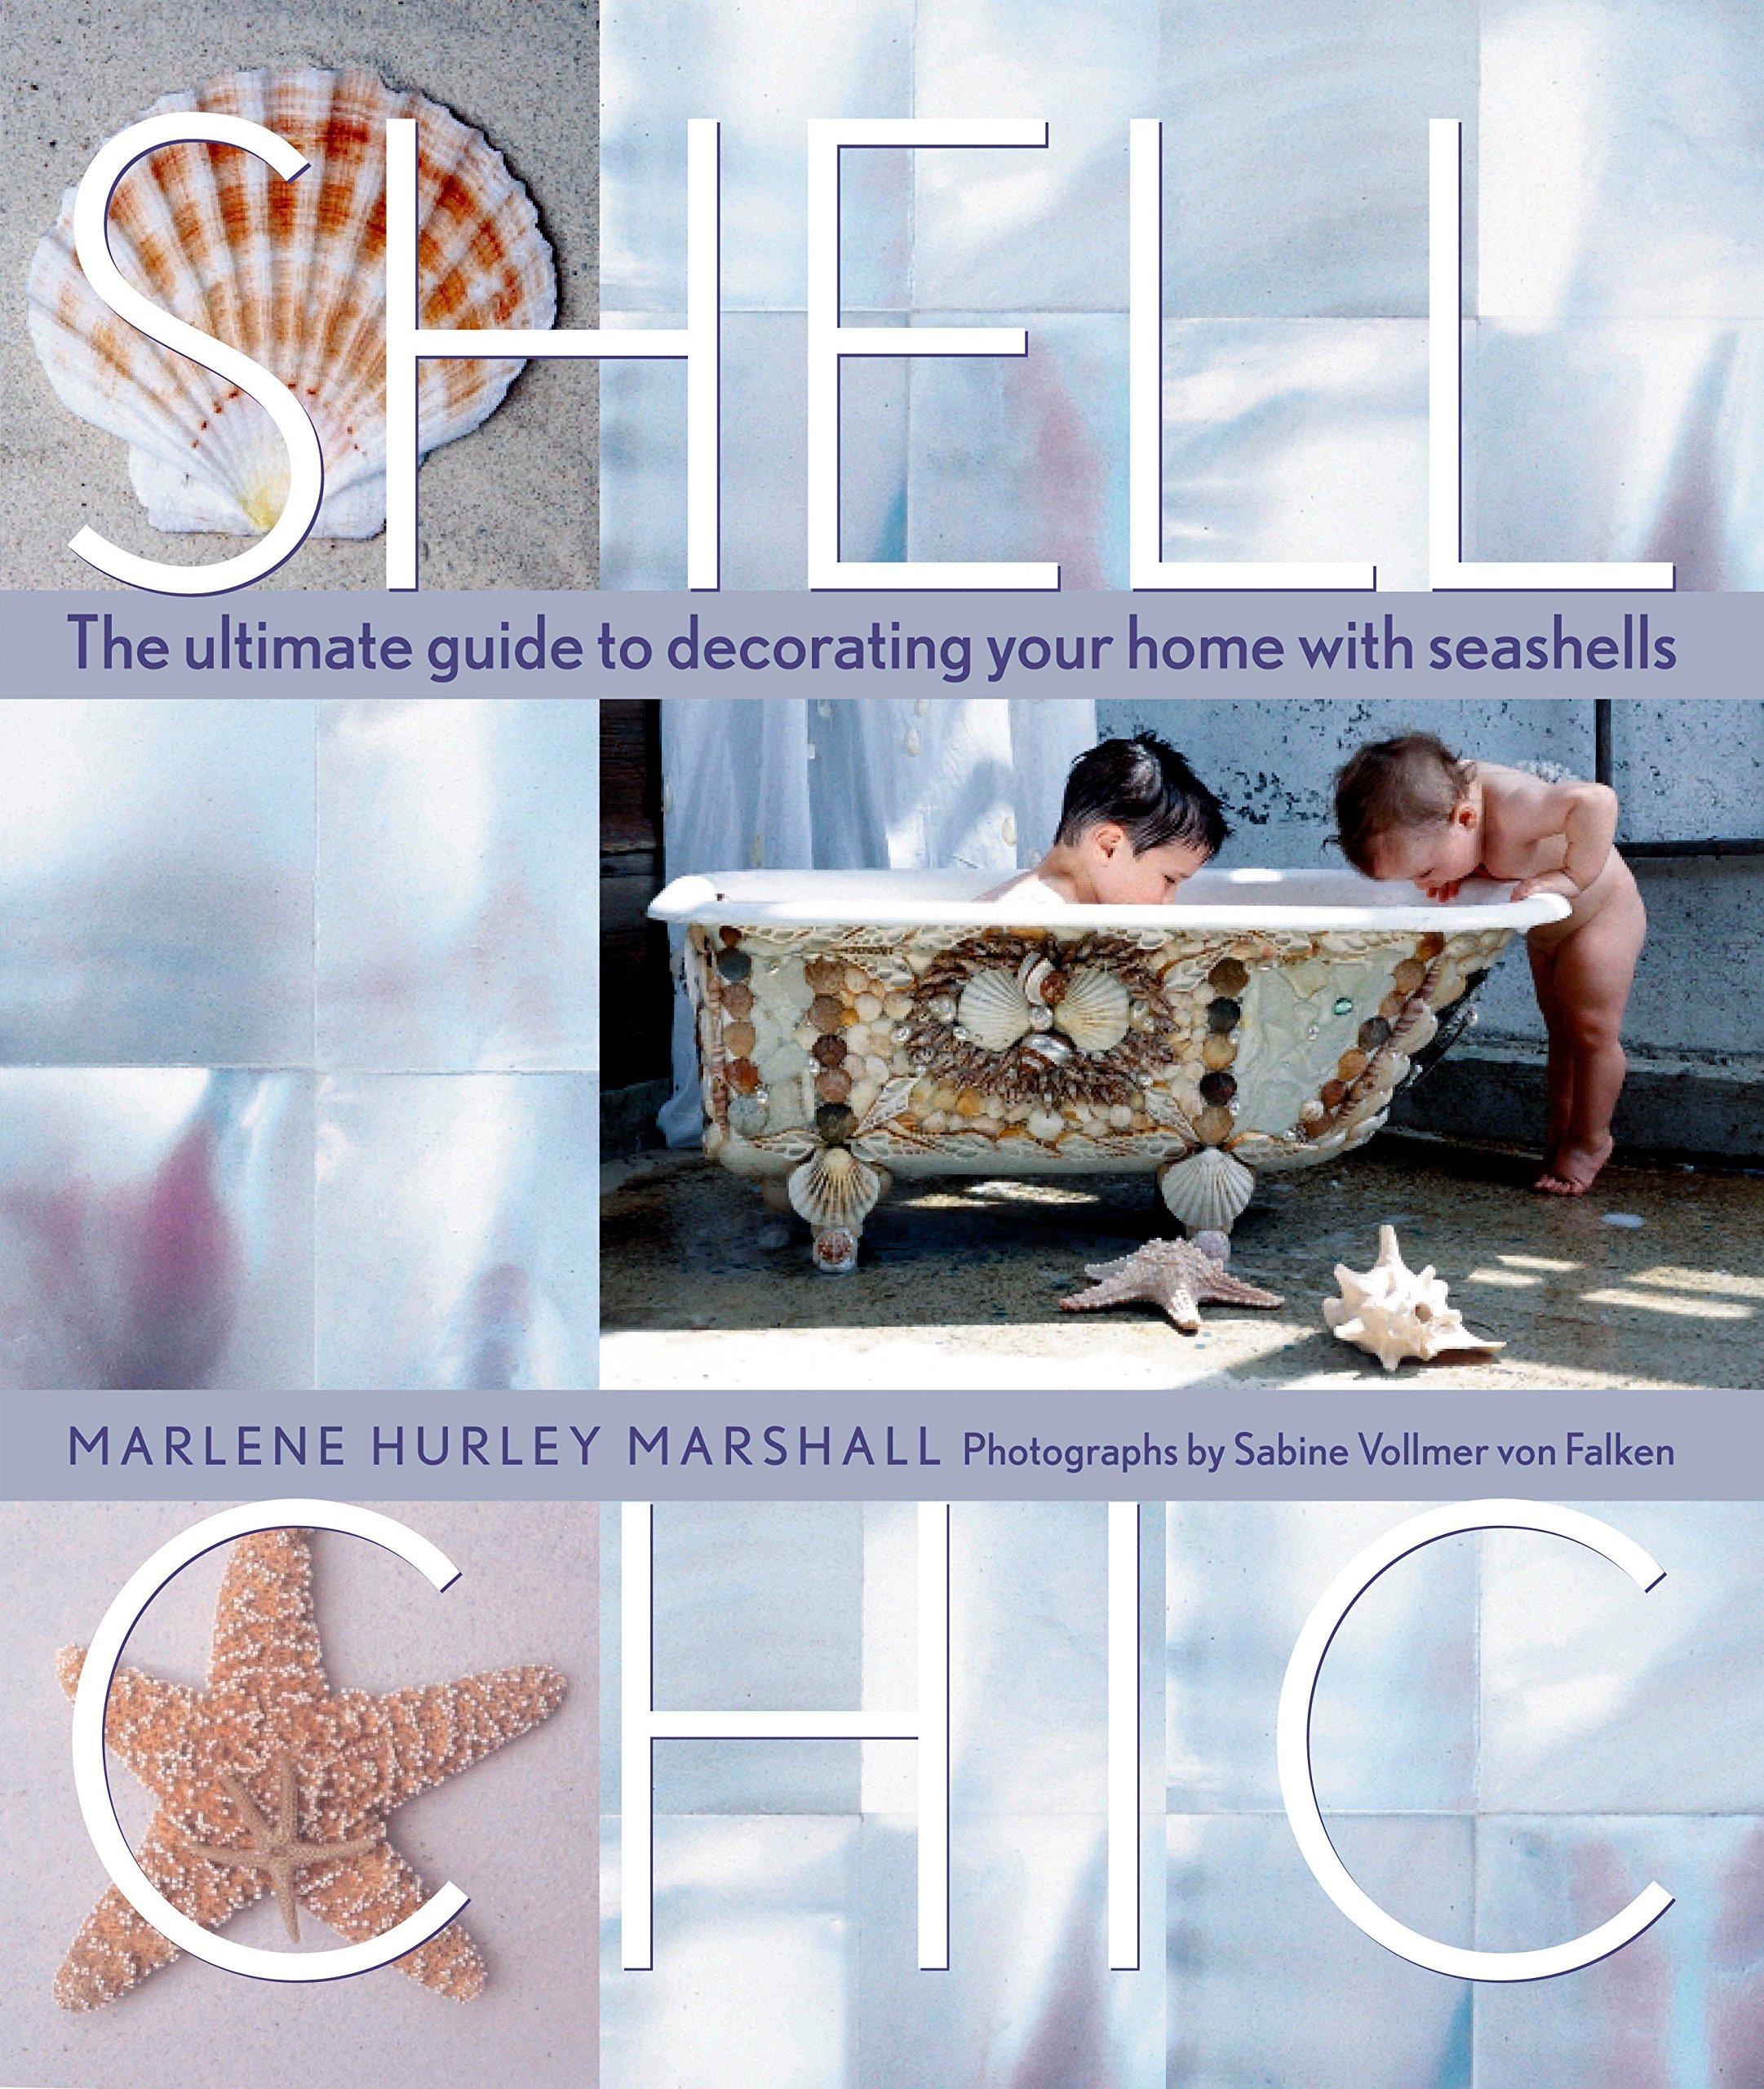 shell chic the ultimate guide to decorating your home with shell chic the ultimate guide to decorating your home with seashells marlene hurley marshall sabine vollmer von falken 9781580174404 amazon com books